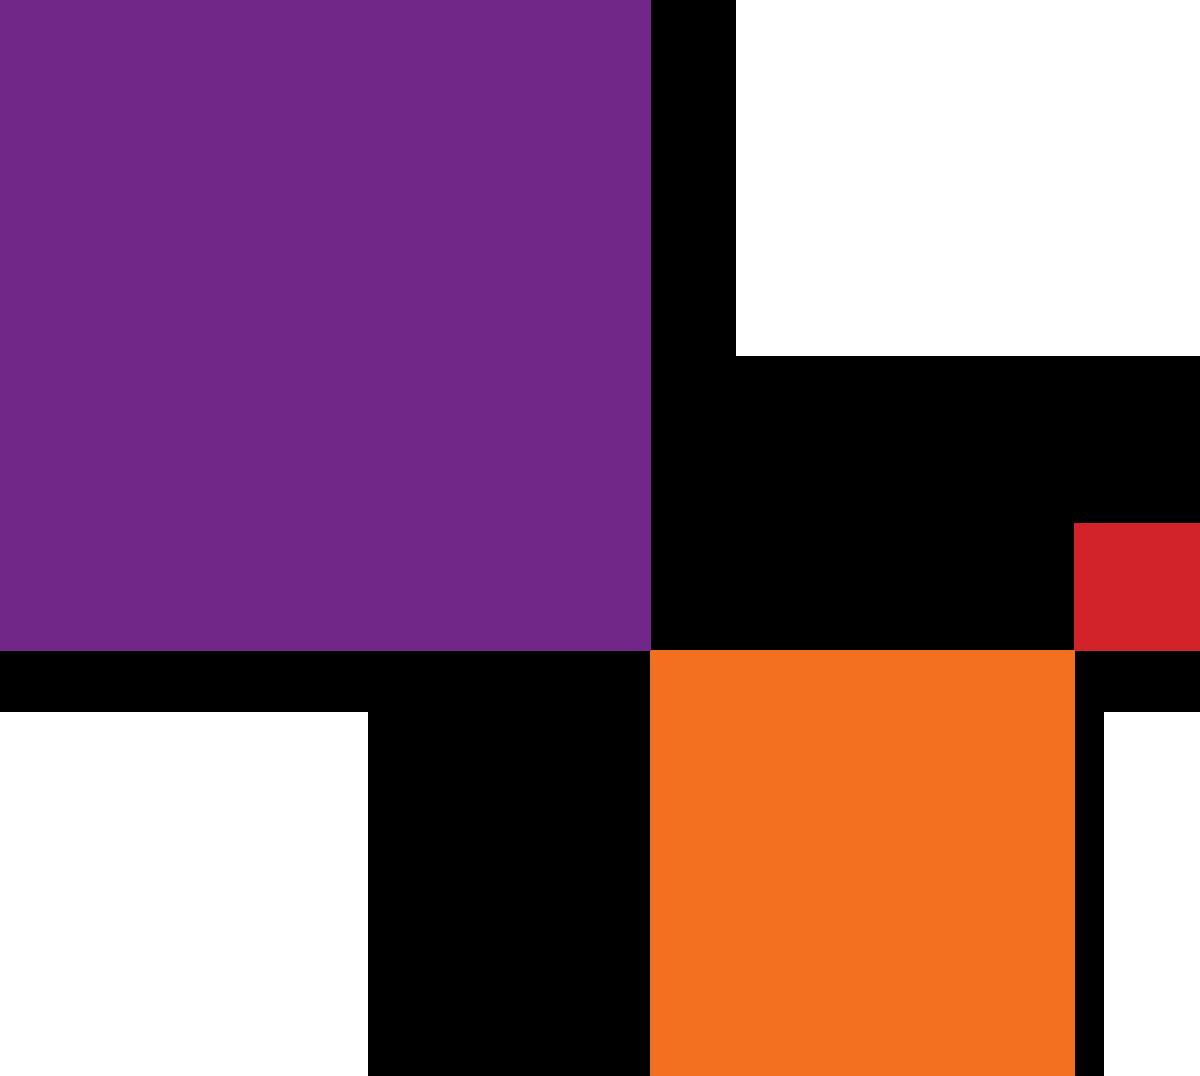 pixel-cluster-tl-p-o-r